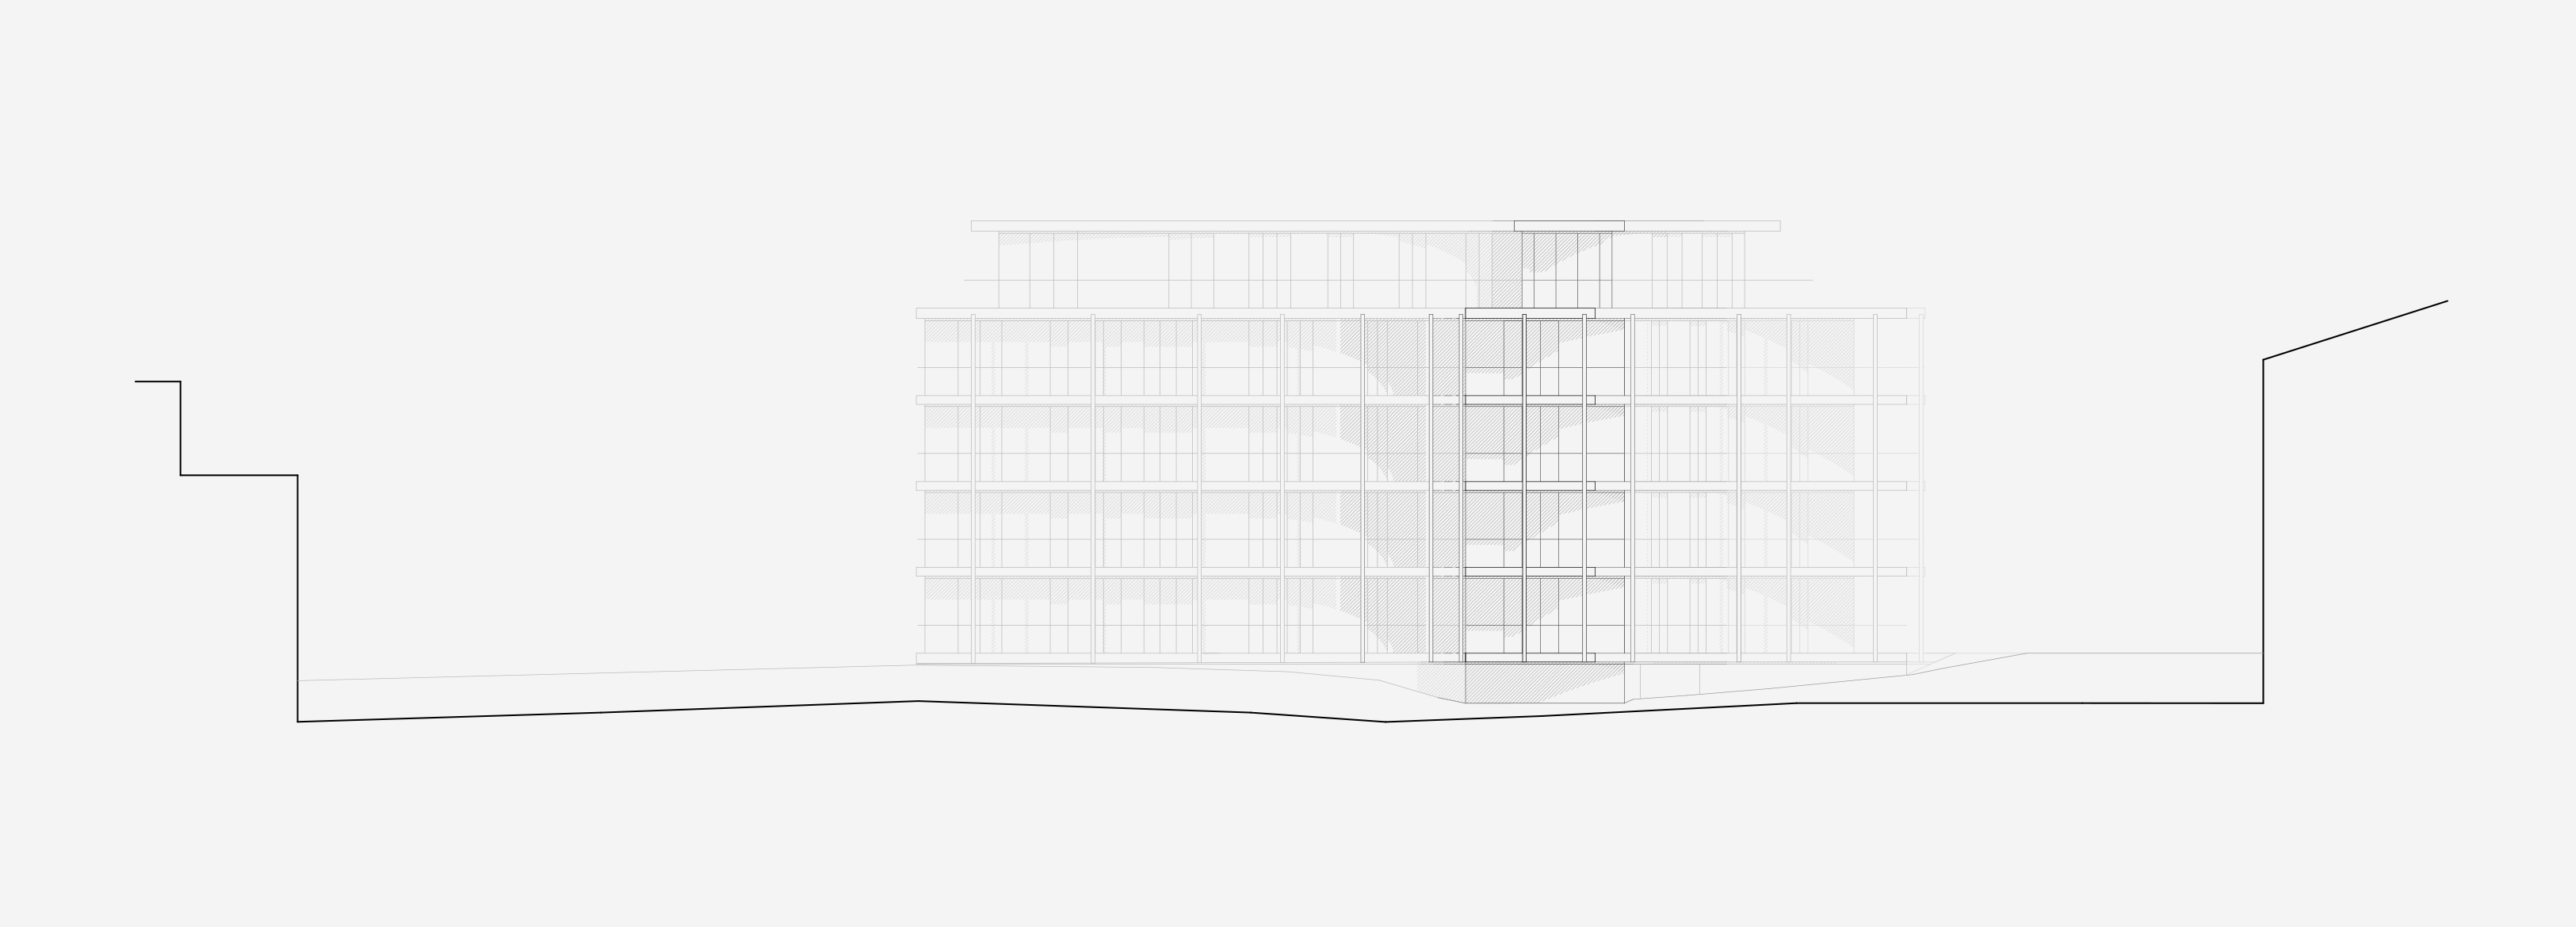 Neubau Wohnhaus Forelhausstiftung Zürich: Nordfassade